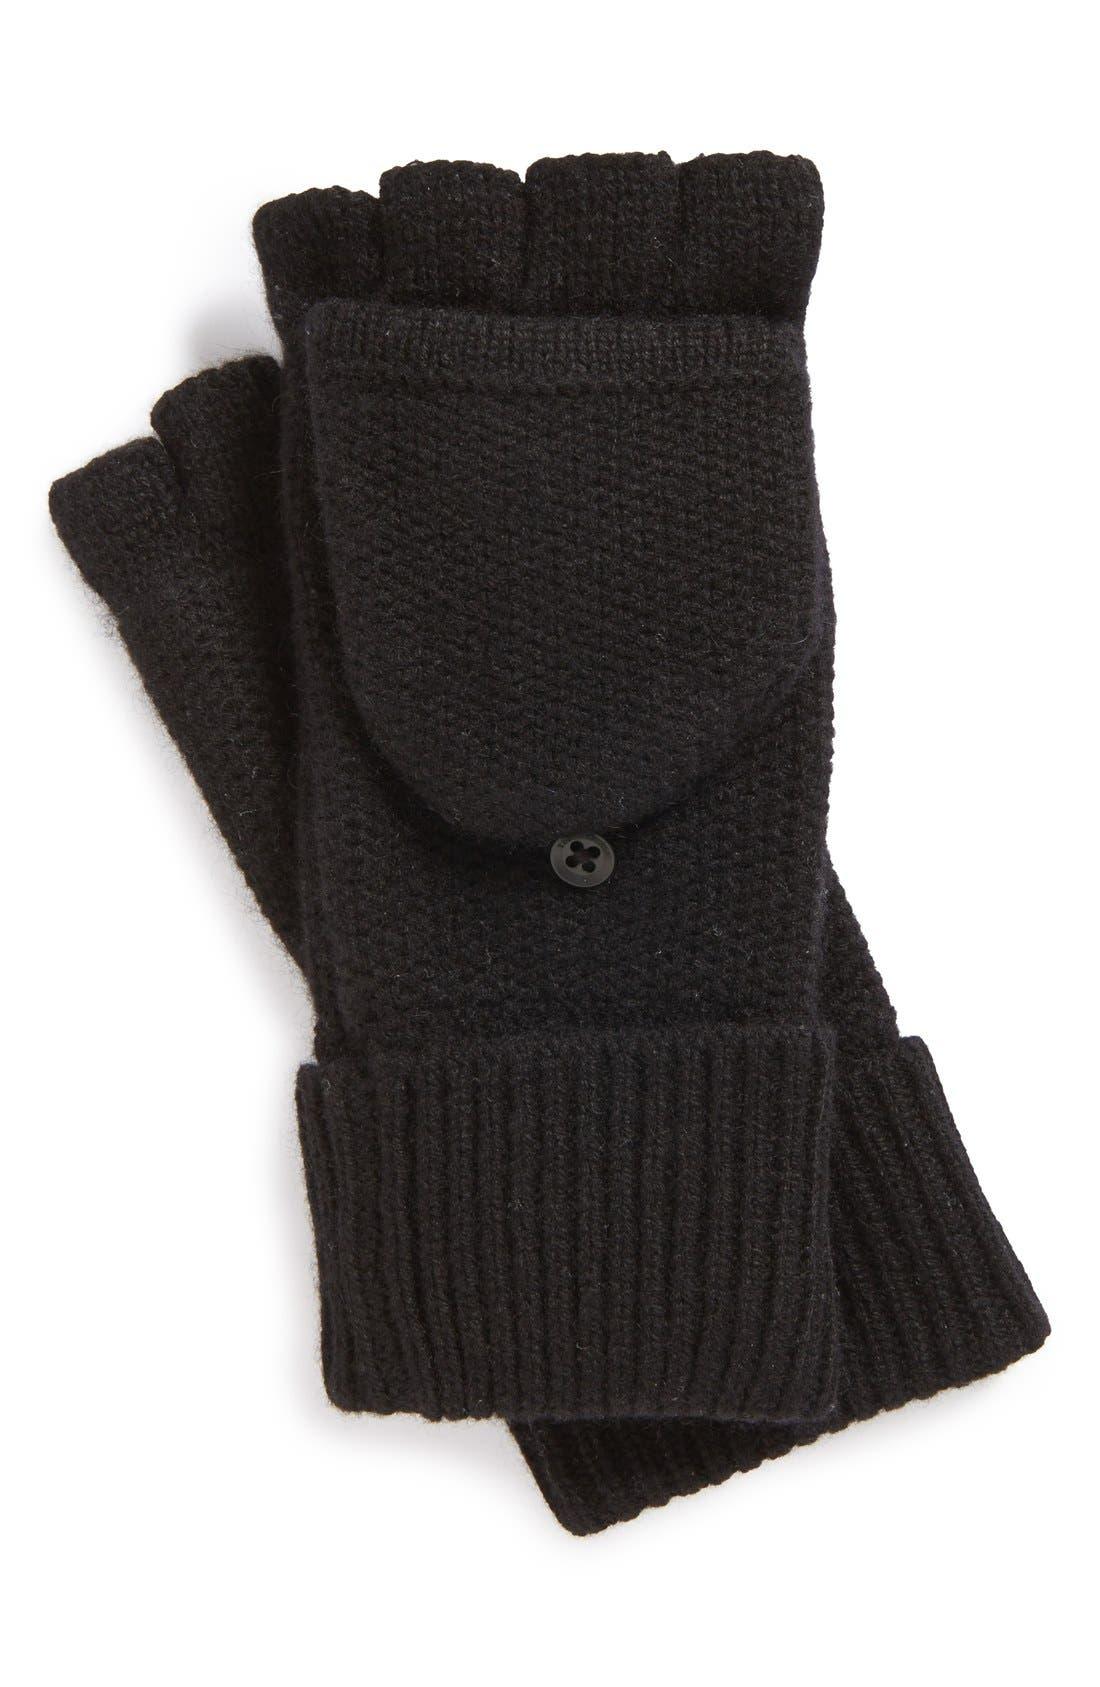 Main Image - rag & bone 'Keighley' Fingerless Cashmere Gloves